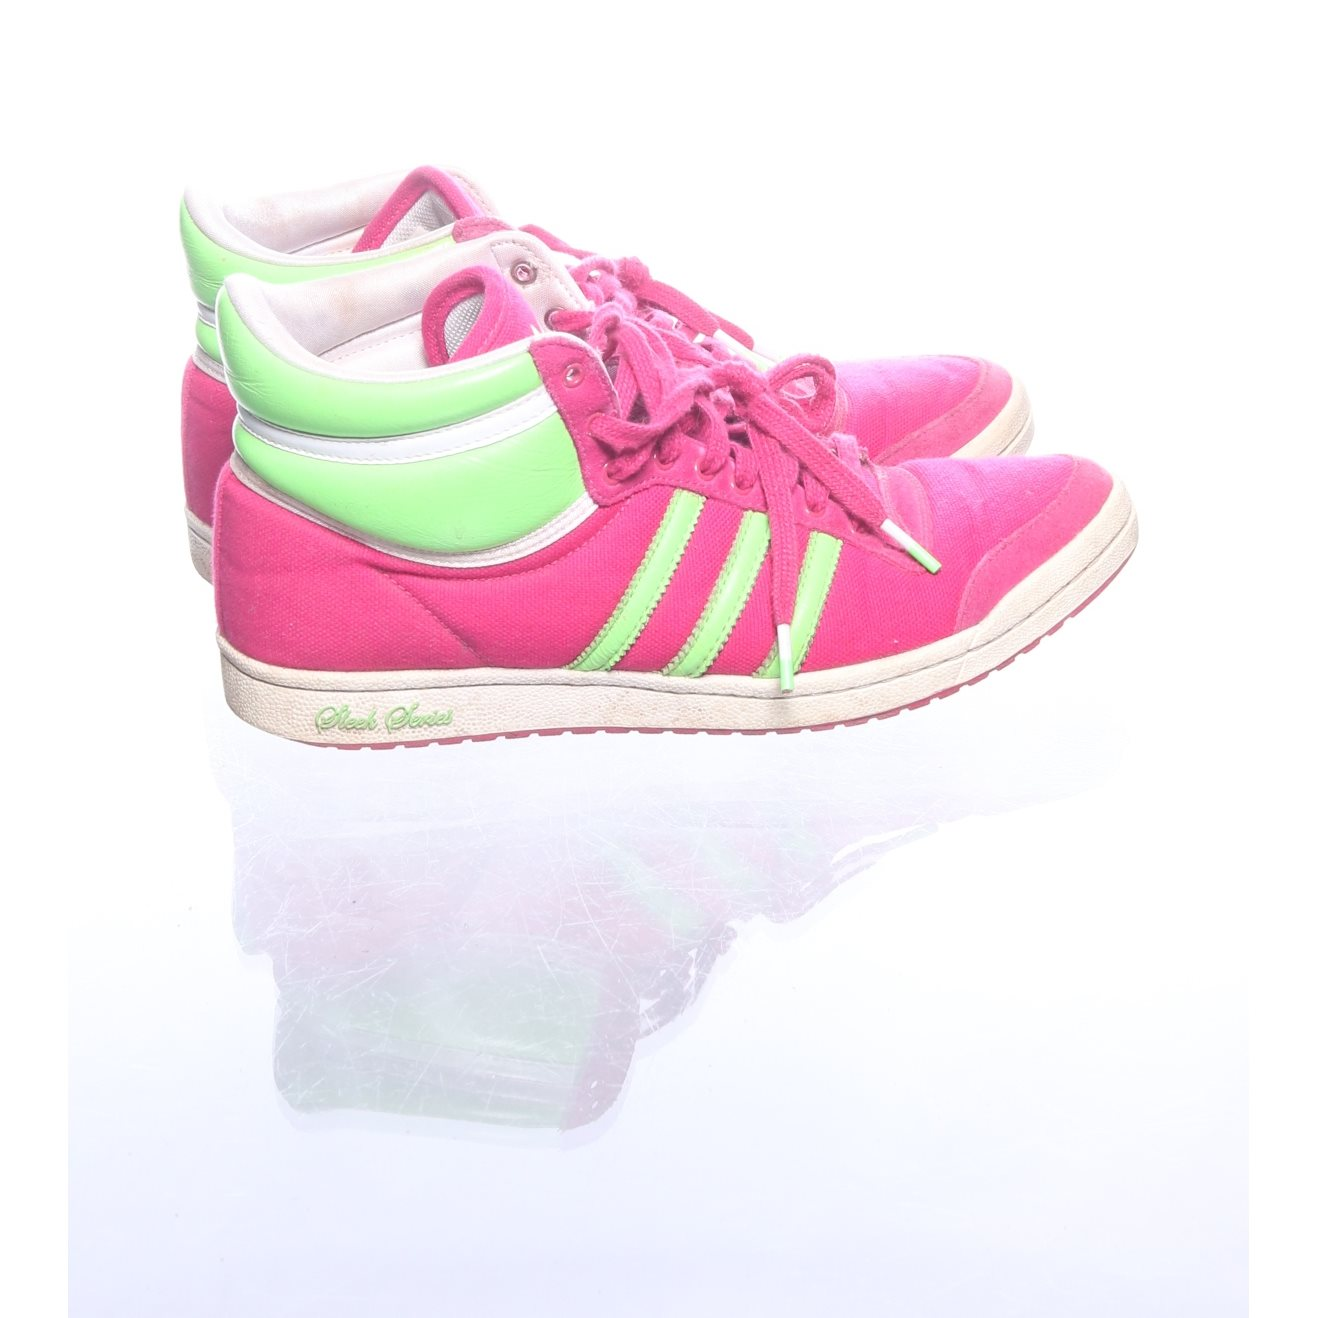 Adidas, Sneakers, Strl: 39 13, RosaFle.. (344651692) ᐈ